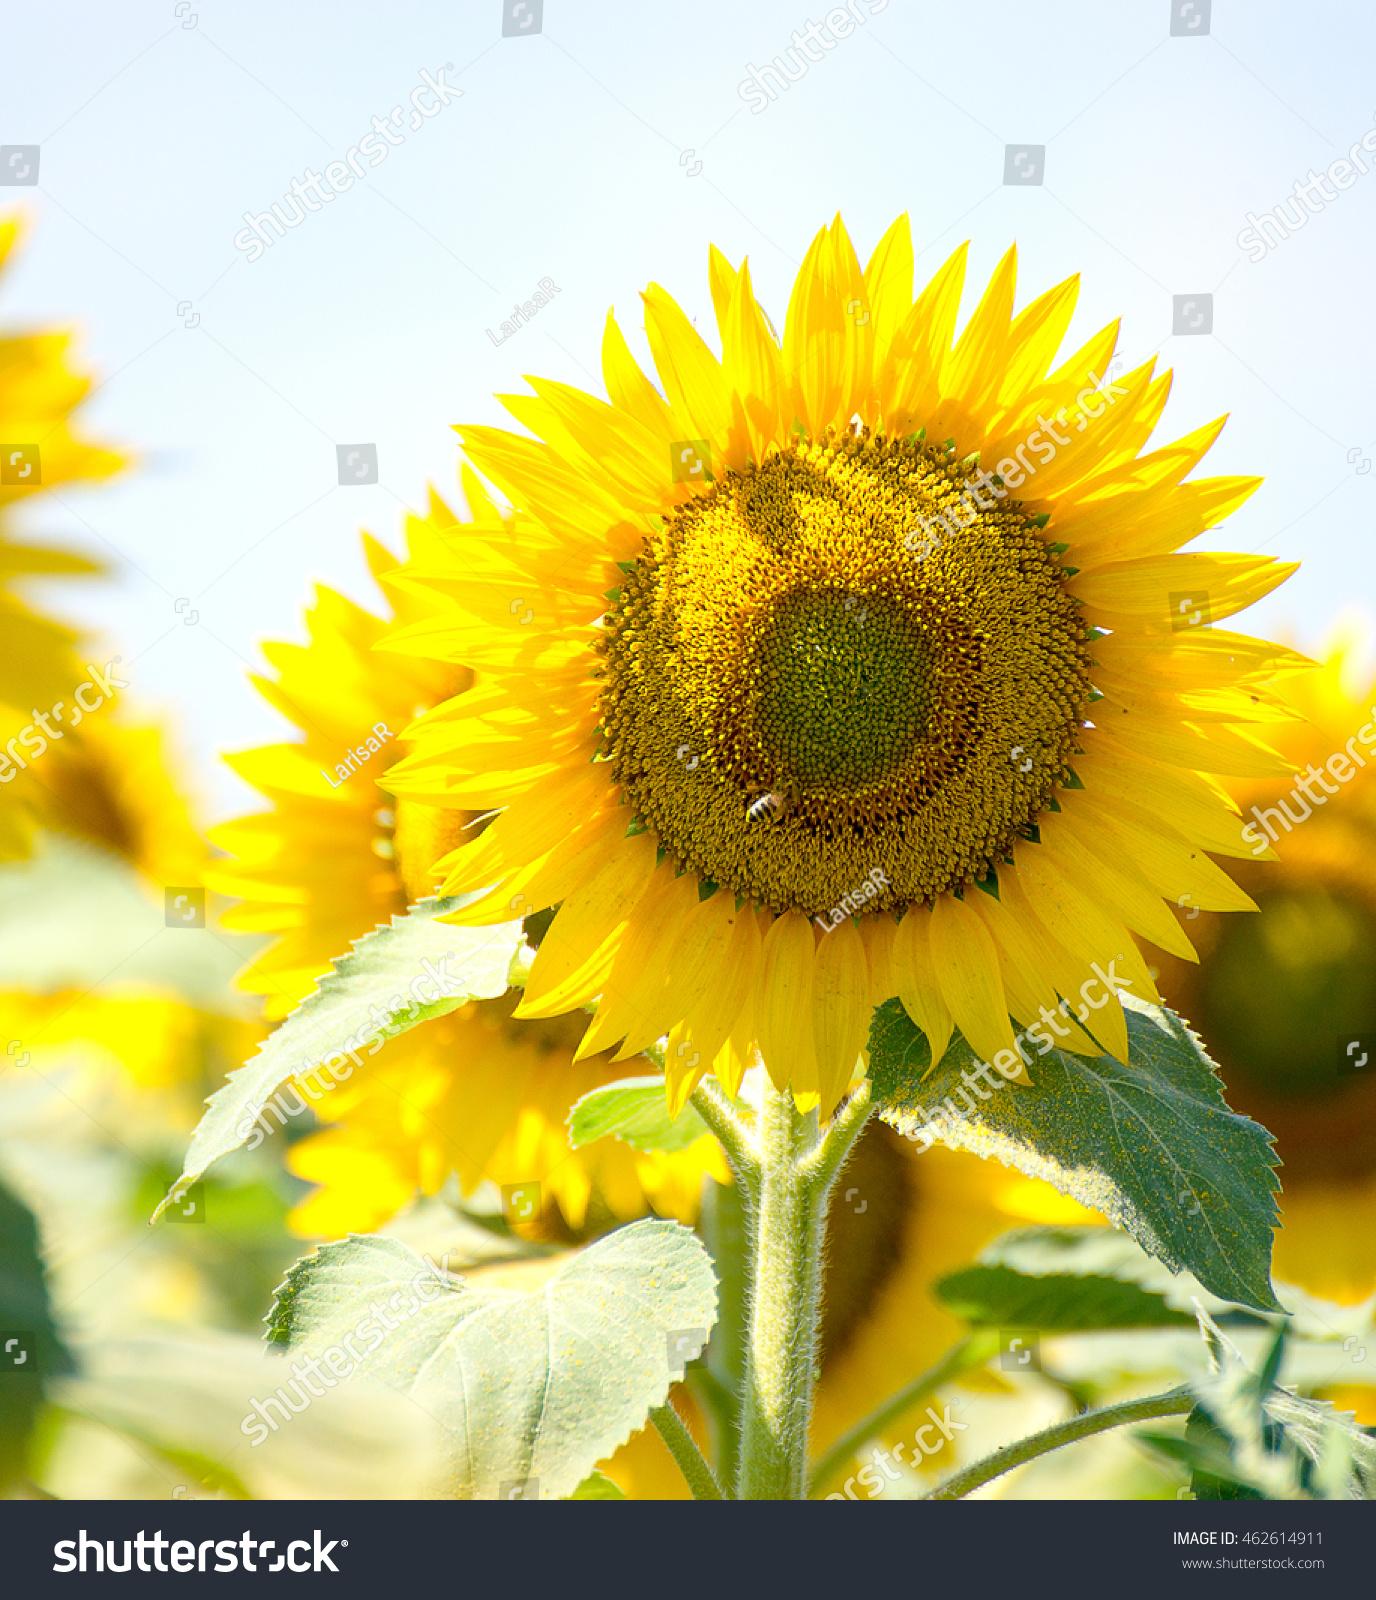 sunflowers flowers green background nature yellow summer wallpaper